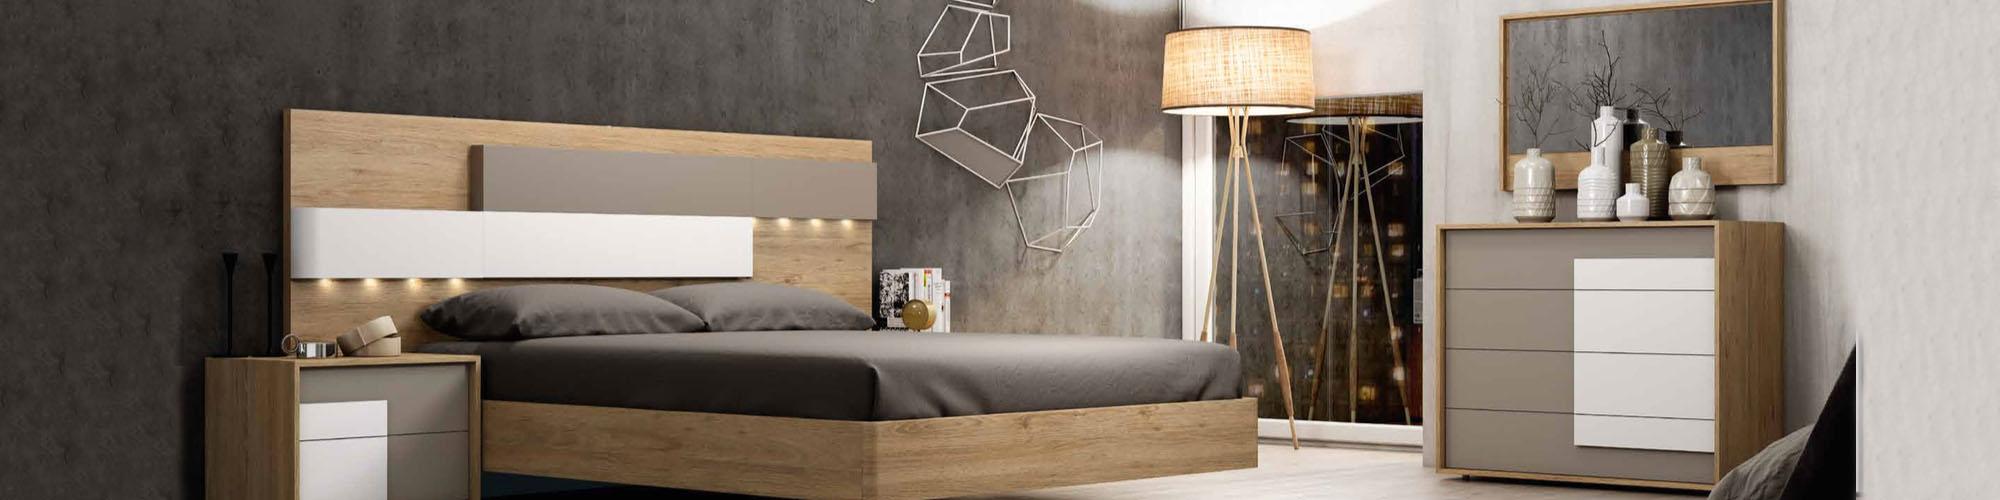 dormitorios-modelsur